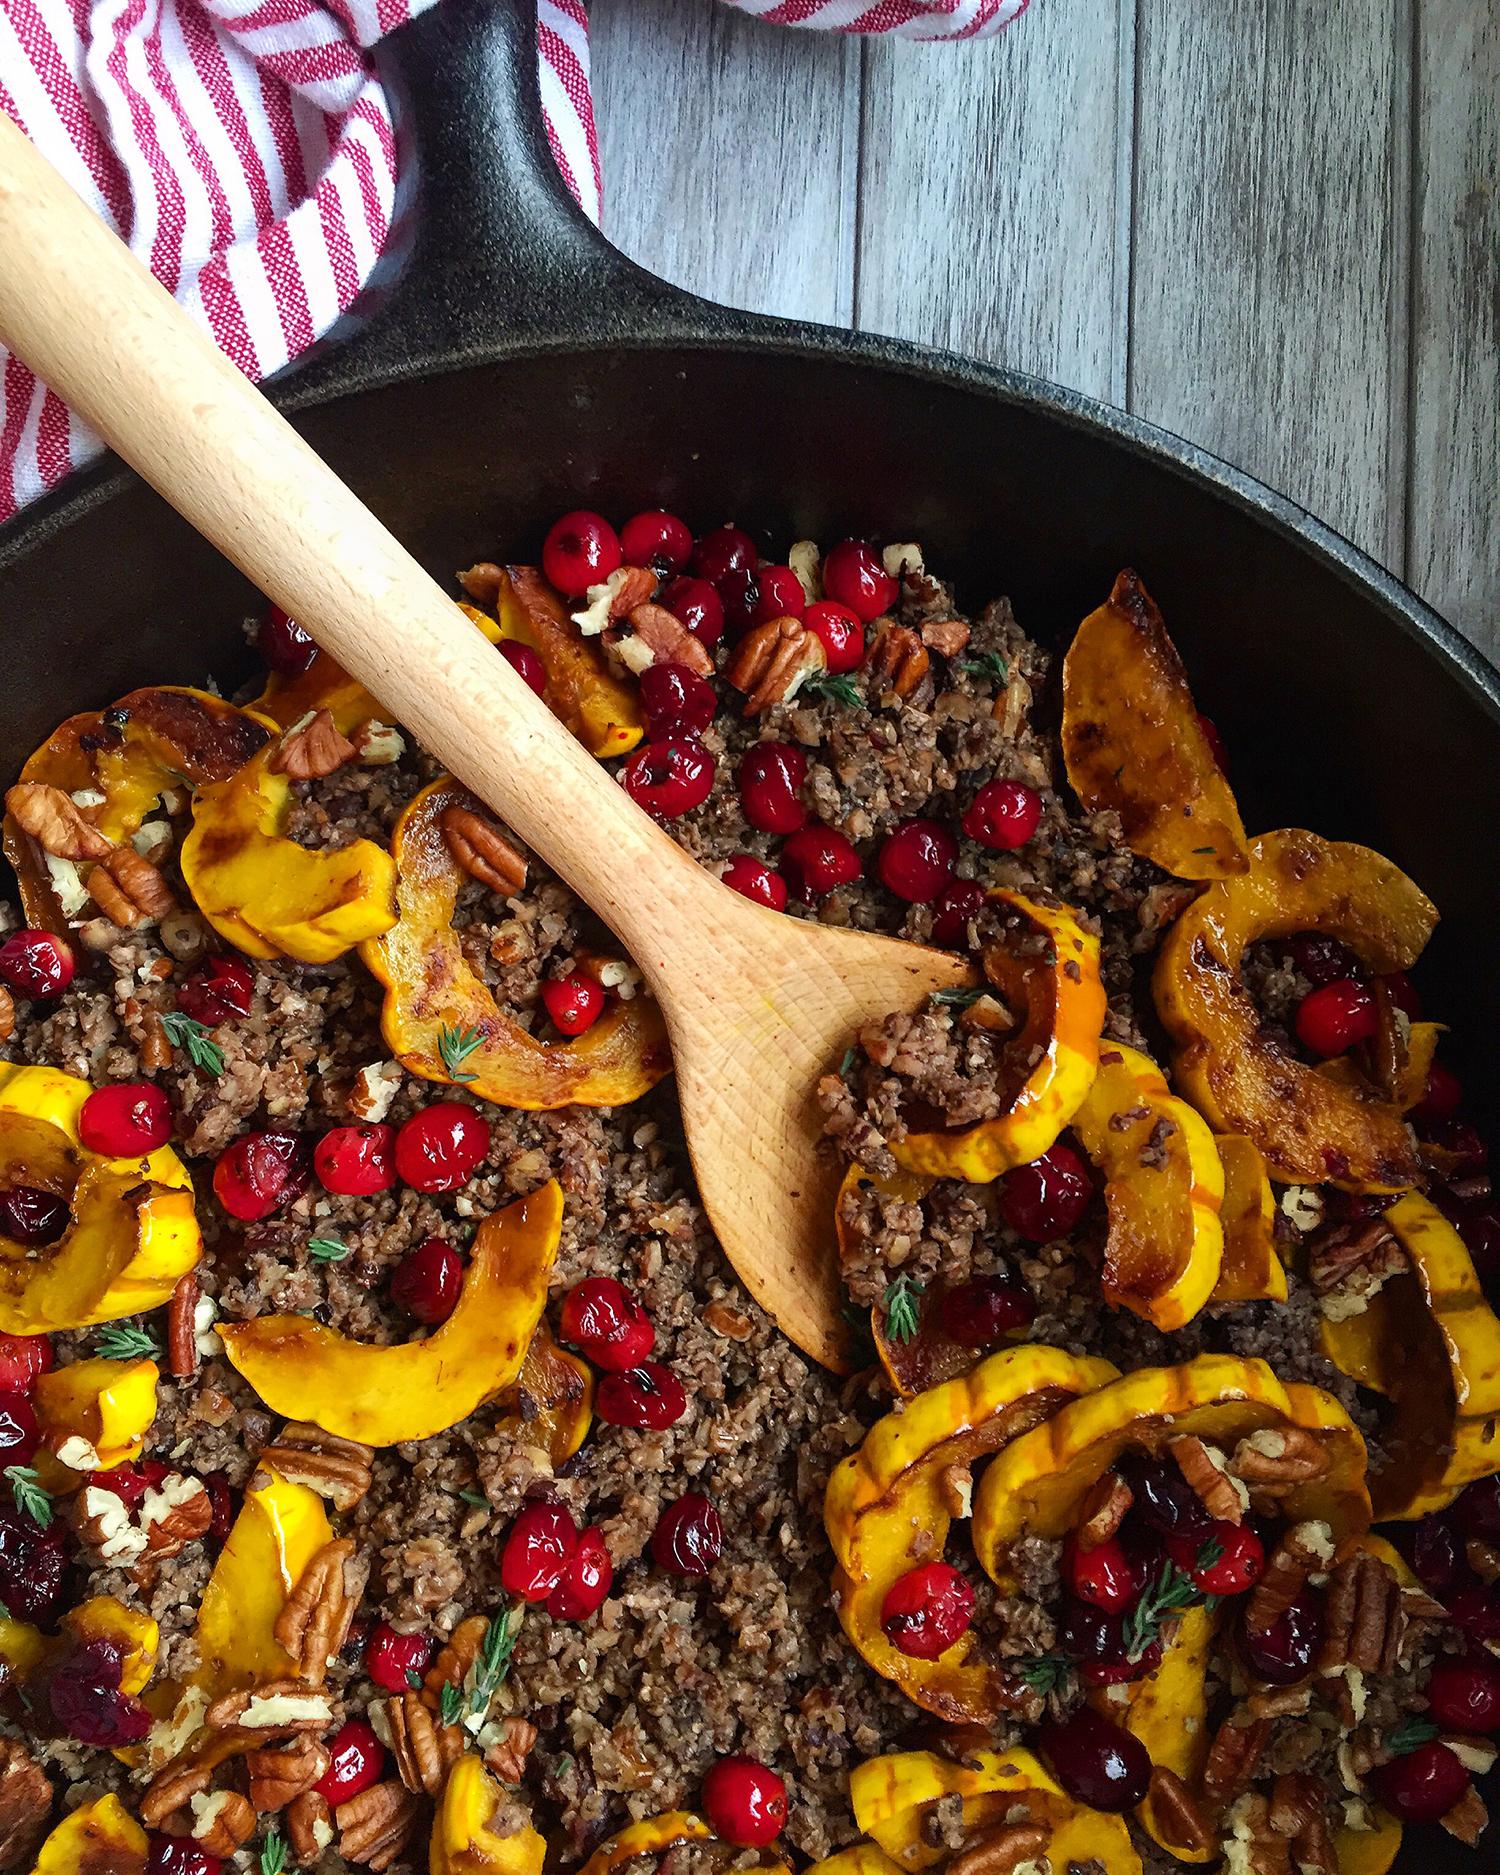 Duck Bacon Winter Hash (bacon, mushrooms, cranberries, squash, pecans, herbs!) #seasonal #paleo #bacon #DArtagnanFeast | Fresh Planet Flavor